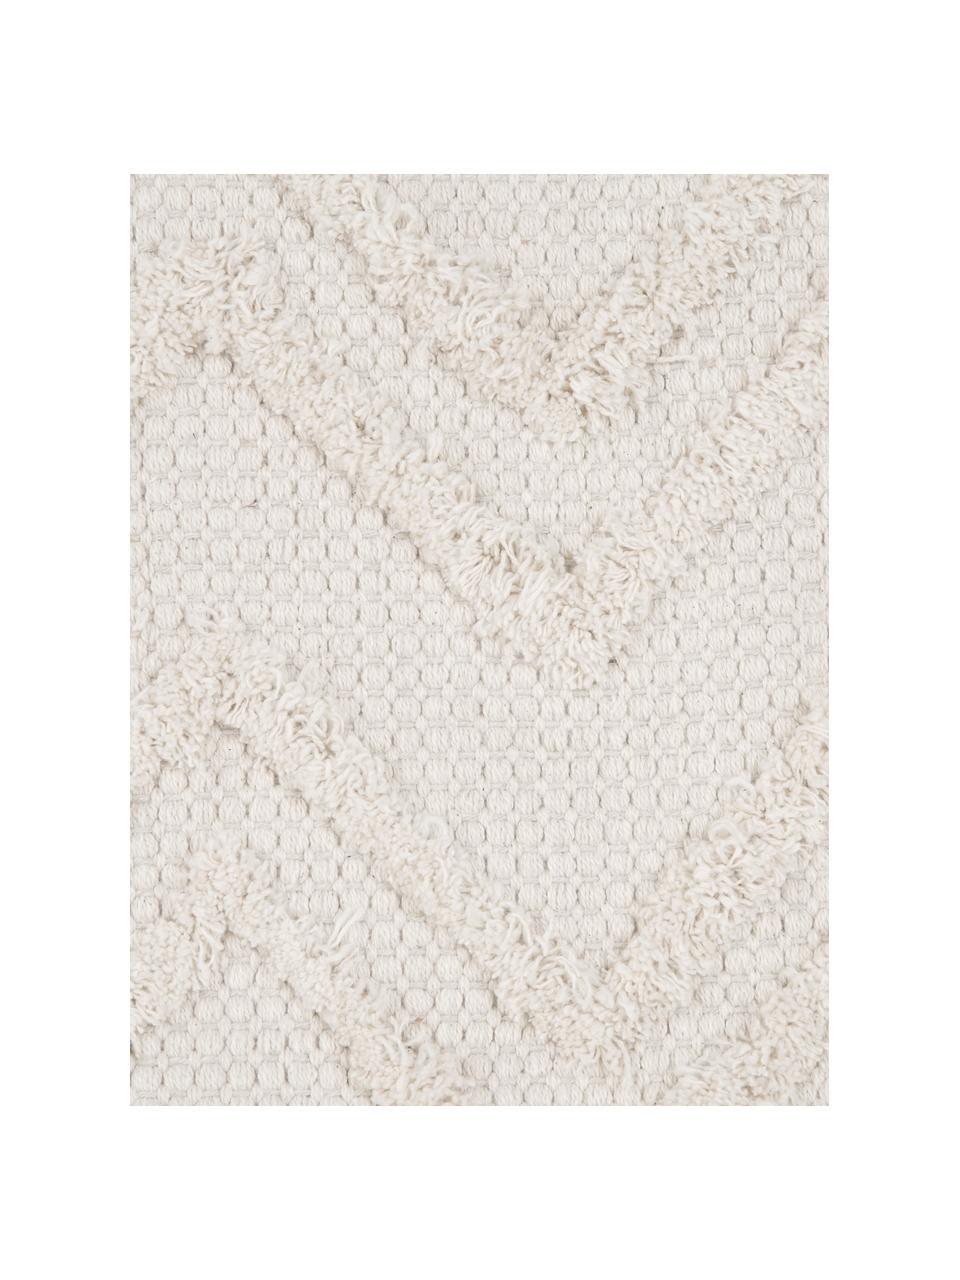 Boho Kissenhülle Akesha mit getuftetem Zickzack-Muster, 100% Baumwolle, Ecru, 45 x 45 cm